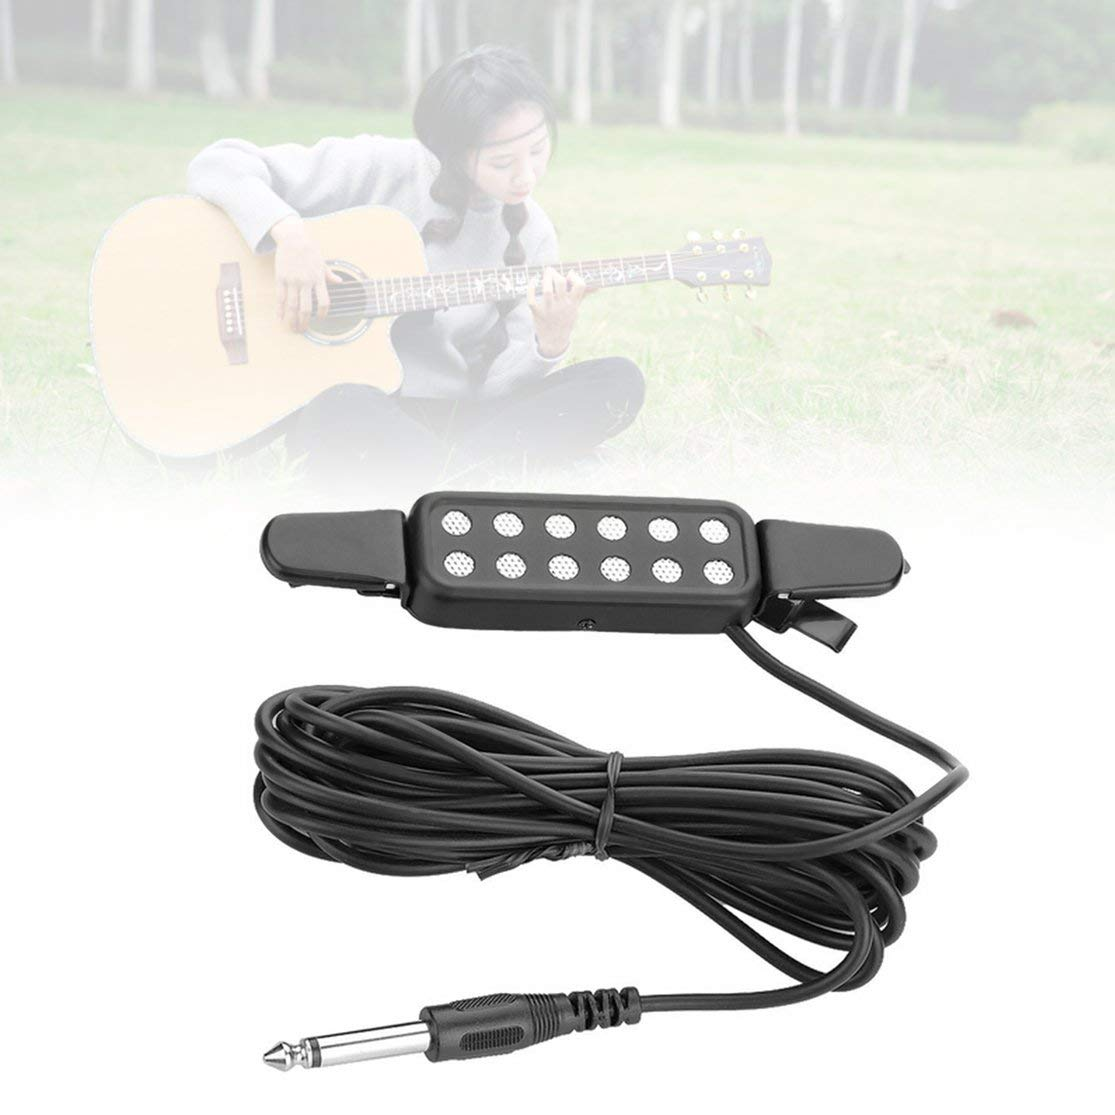 LouiseEvel215 12-Loch-Clip auf Tonabnehmer Mikrofon Drahtverst/ärker Lautsprecher f/ür akustische E-Gitarre Wandler Gitarrenzubeh/ör